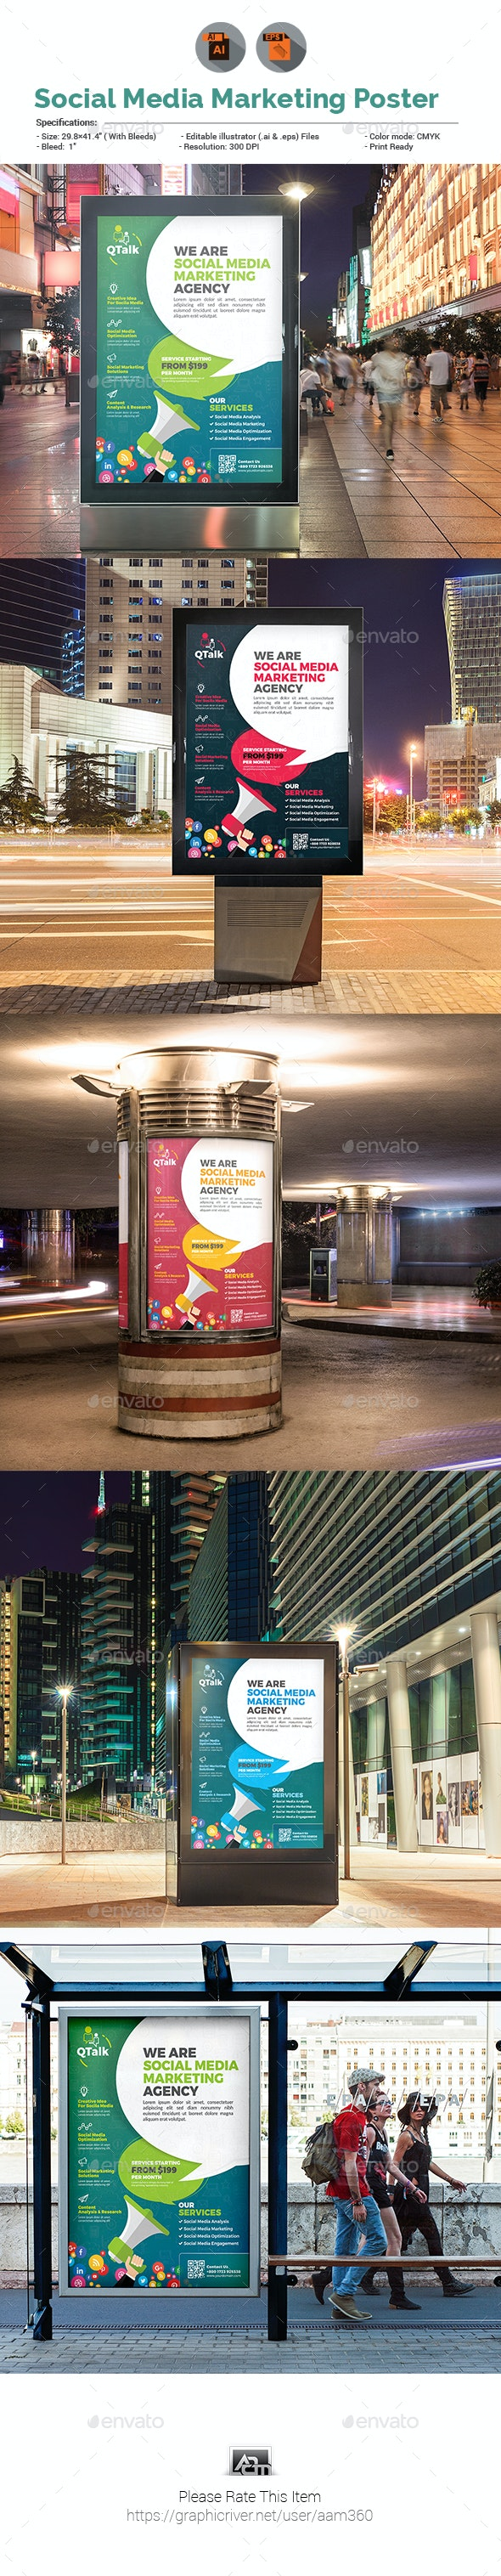 Social Media Marketing Poster V3 - Signage Print Templates